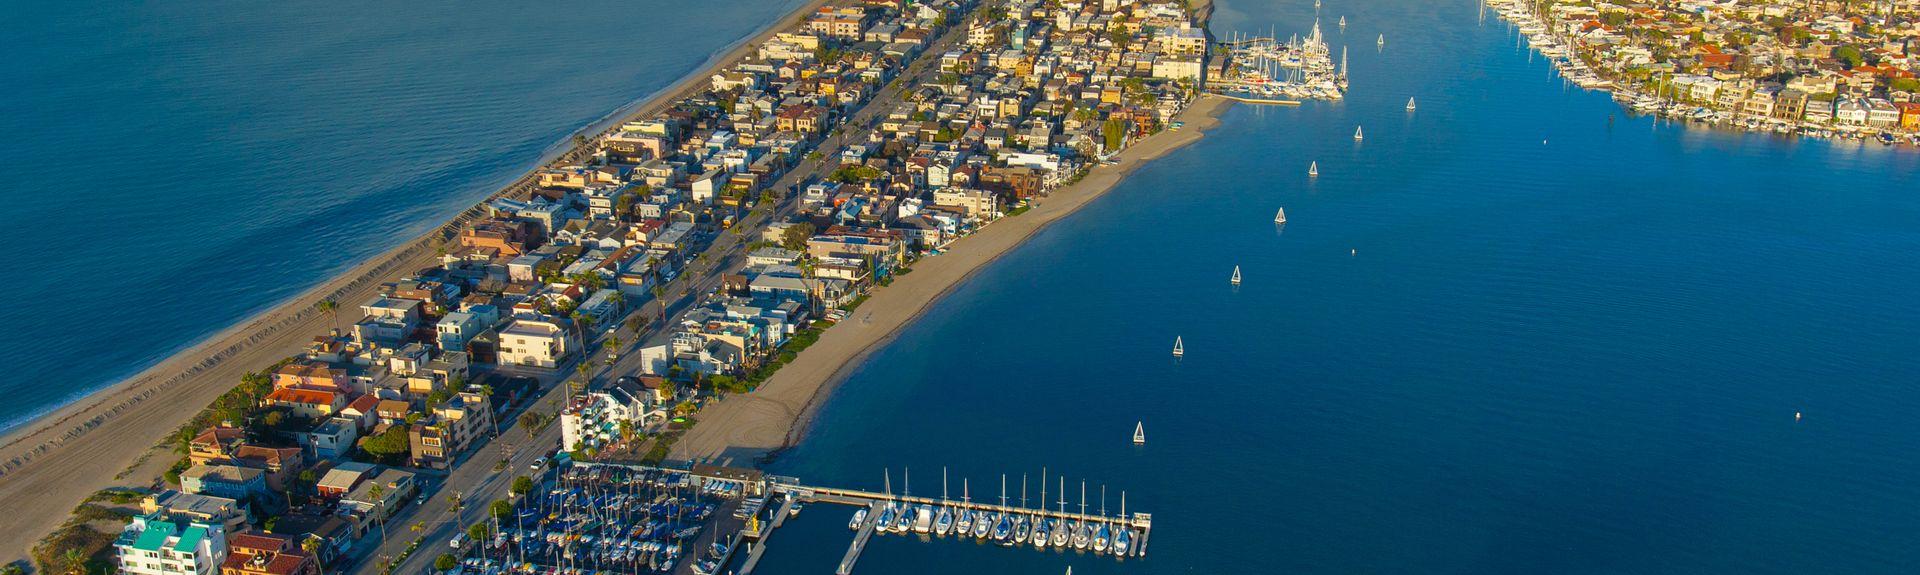 Naples Island, Long Beach, California, United States of America